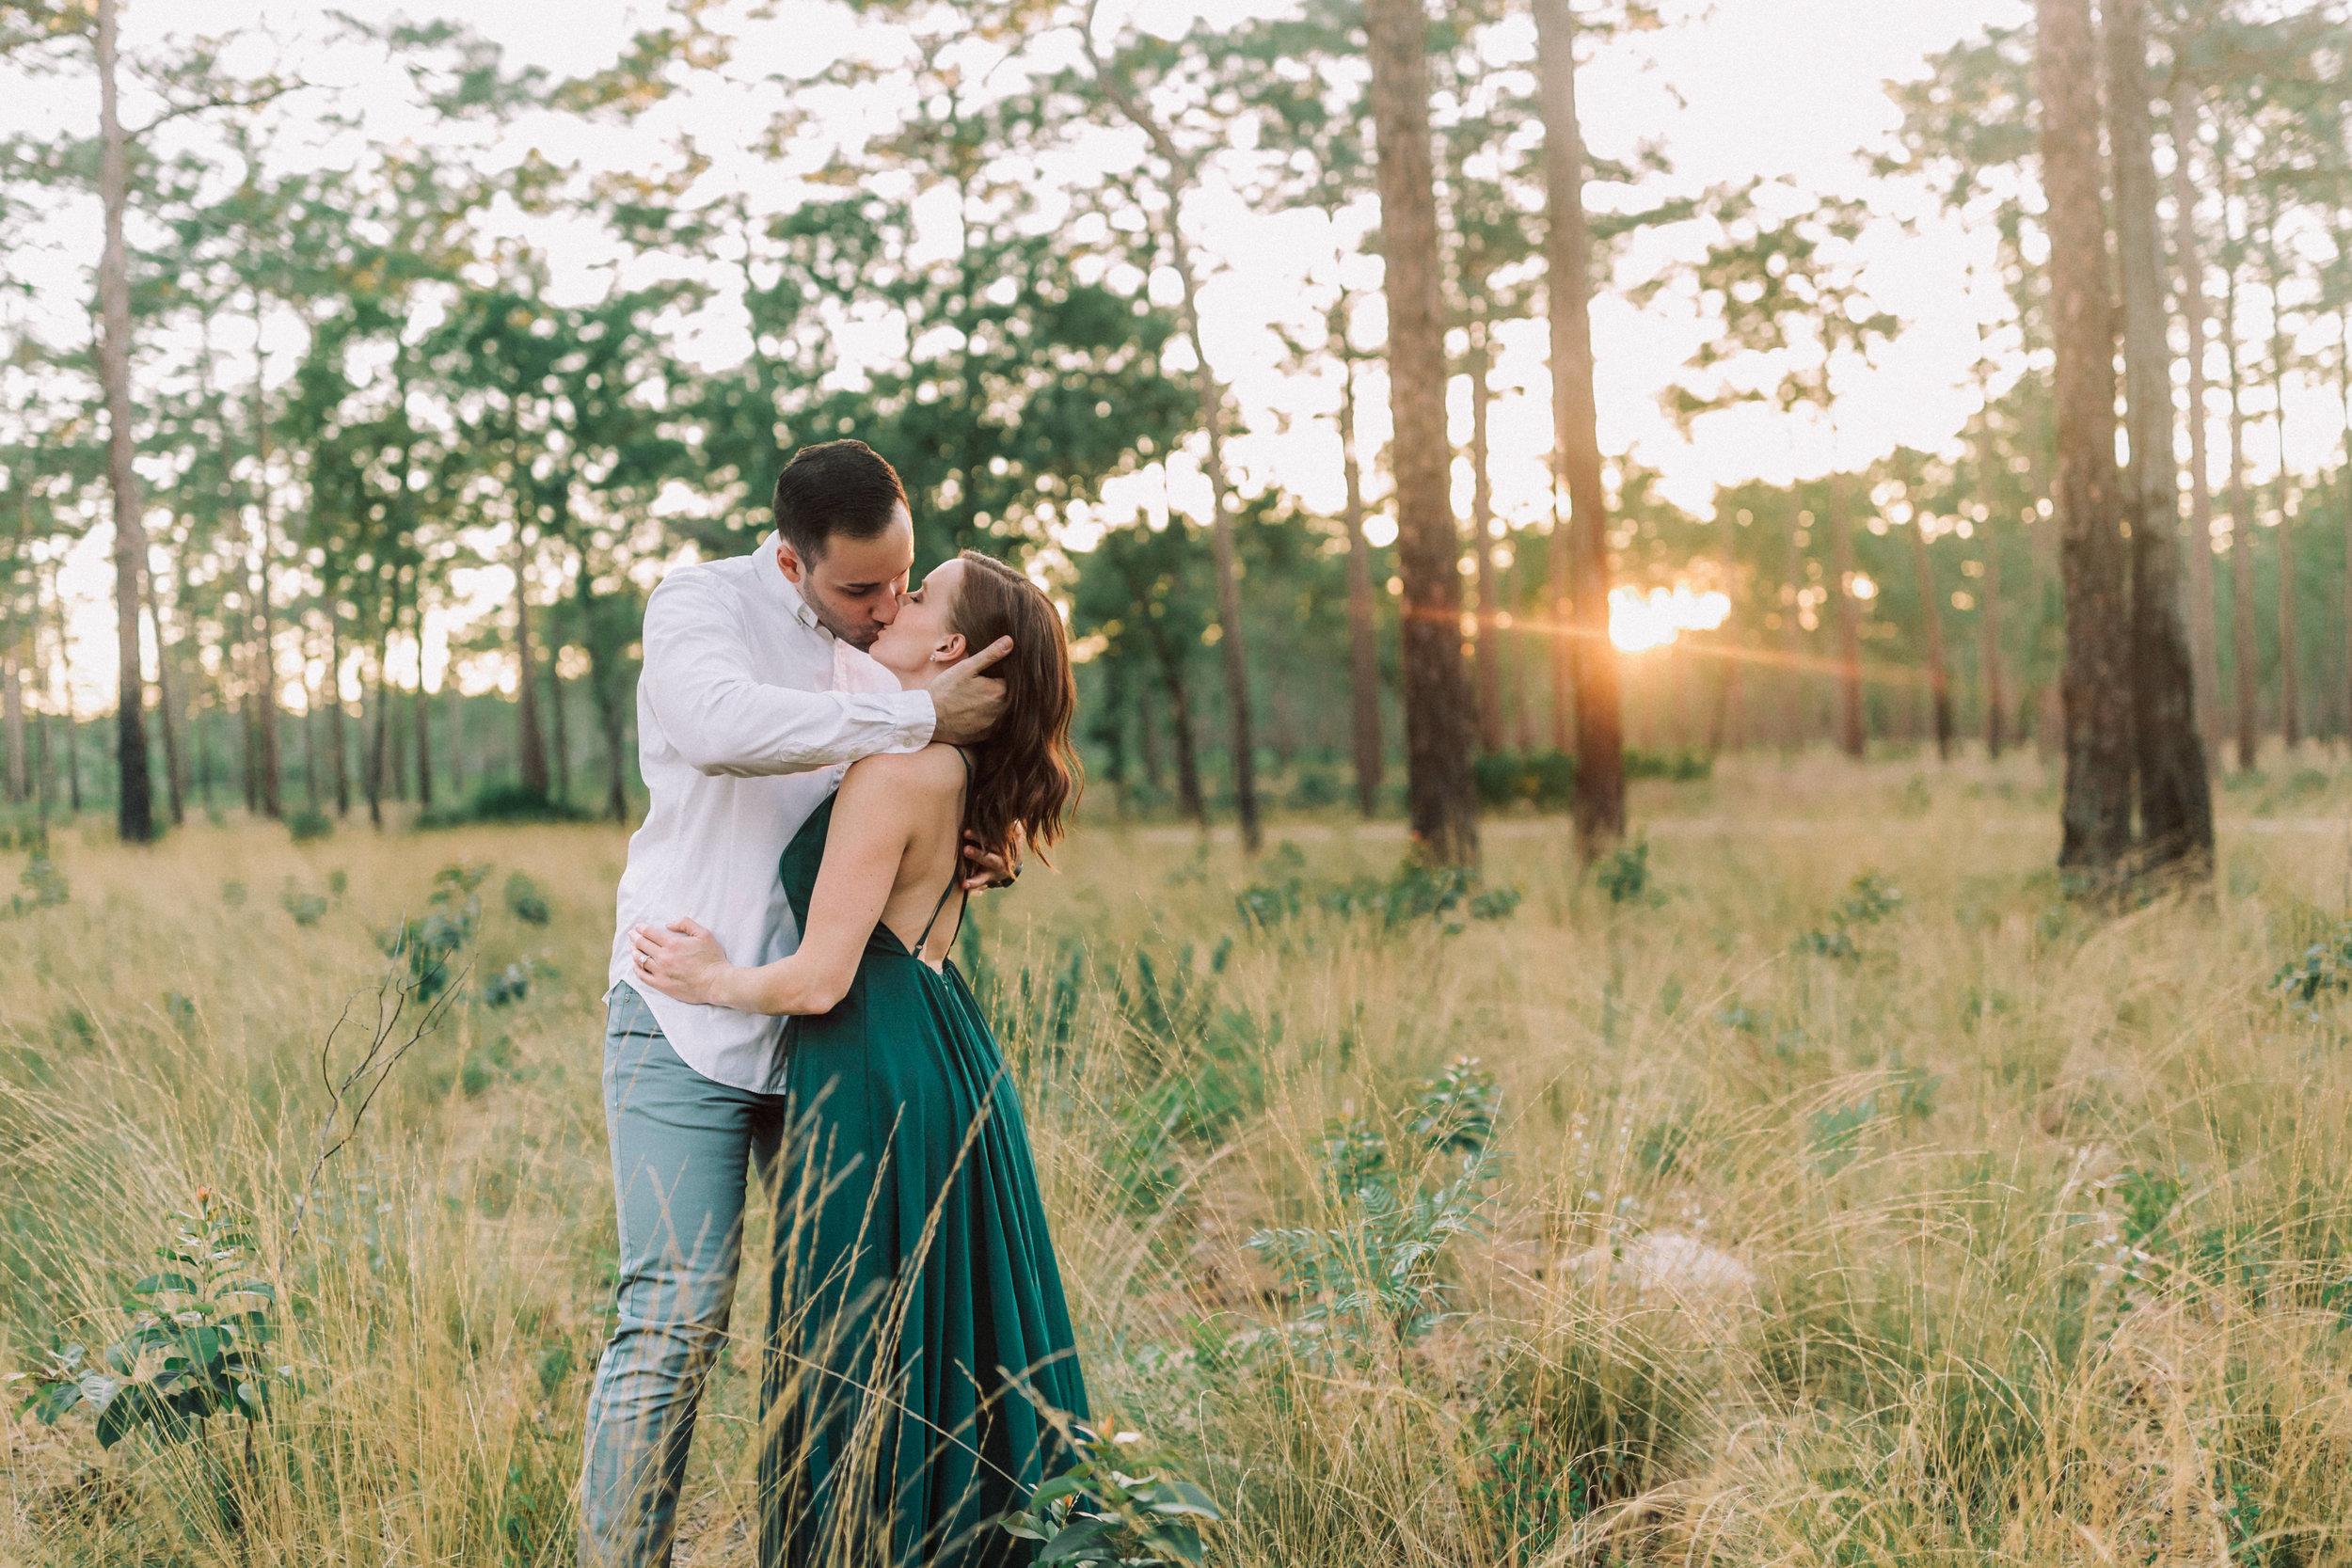 Orlando Engagement session at Wekiva Springs State Park nature-Anthony + Christine 37.jpg